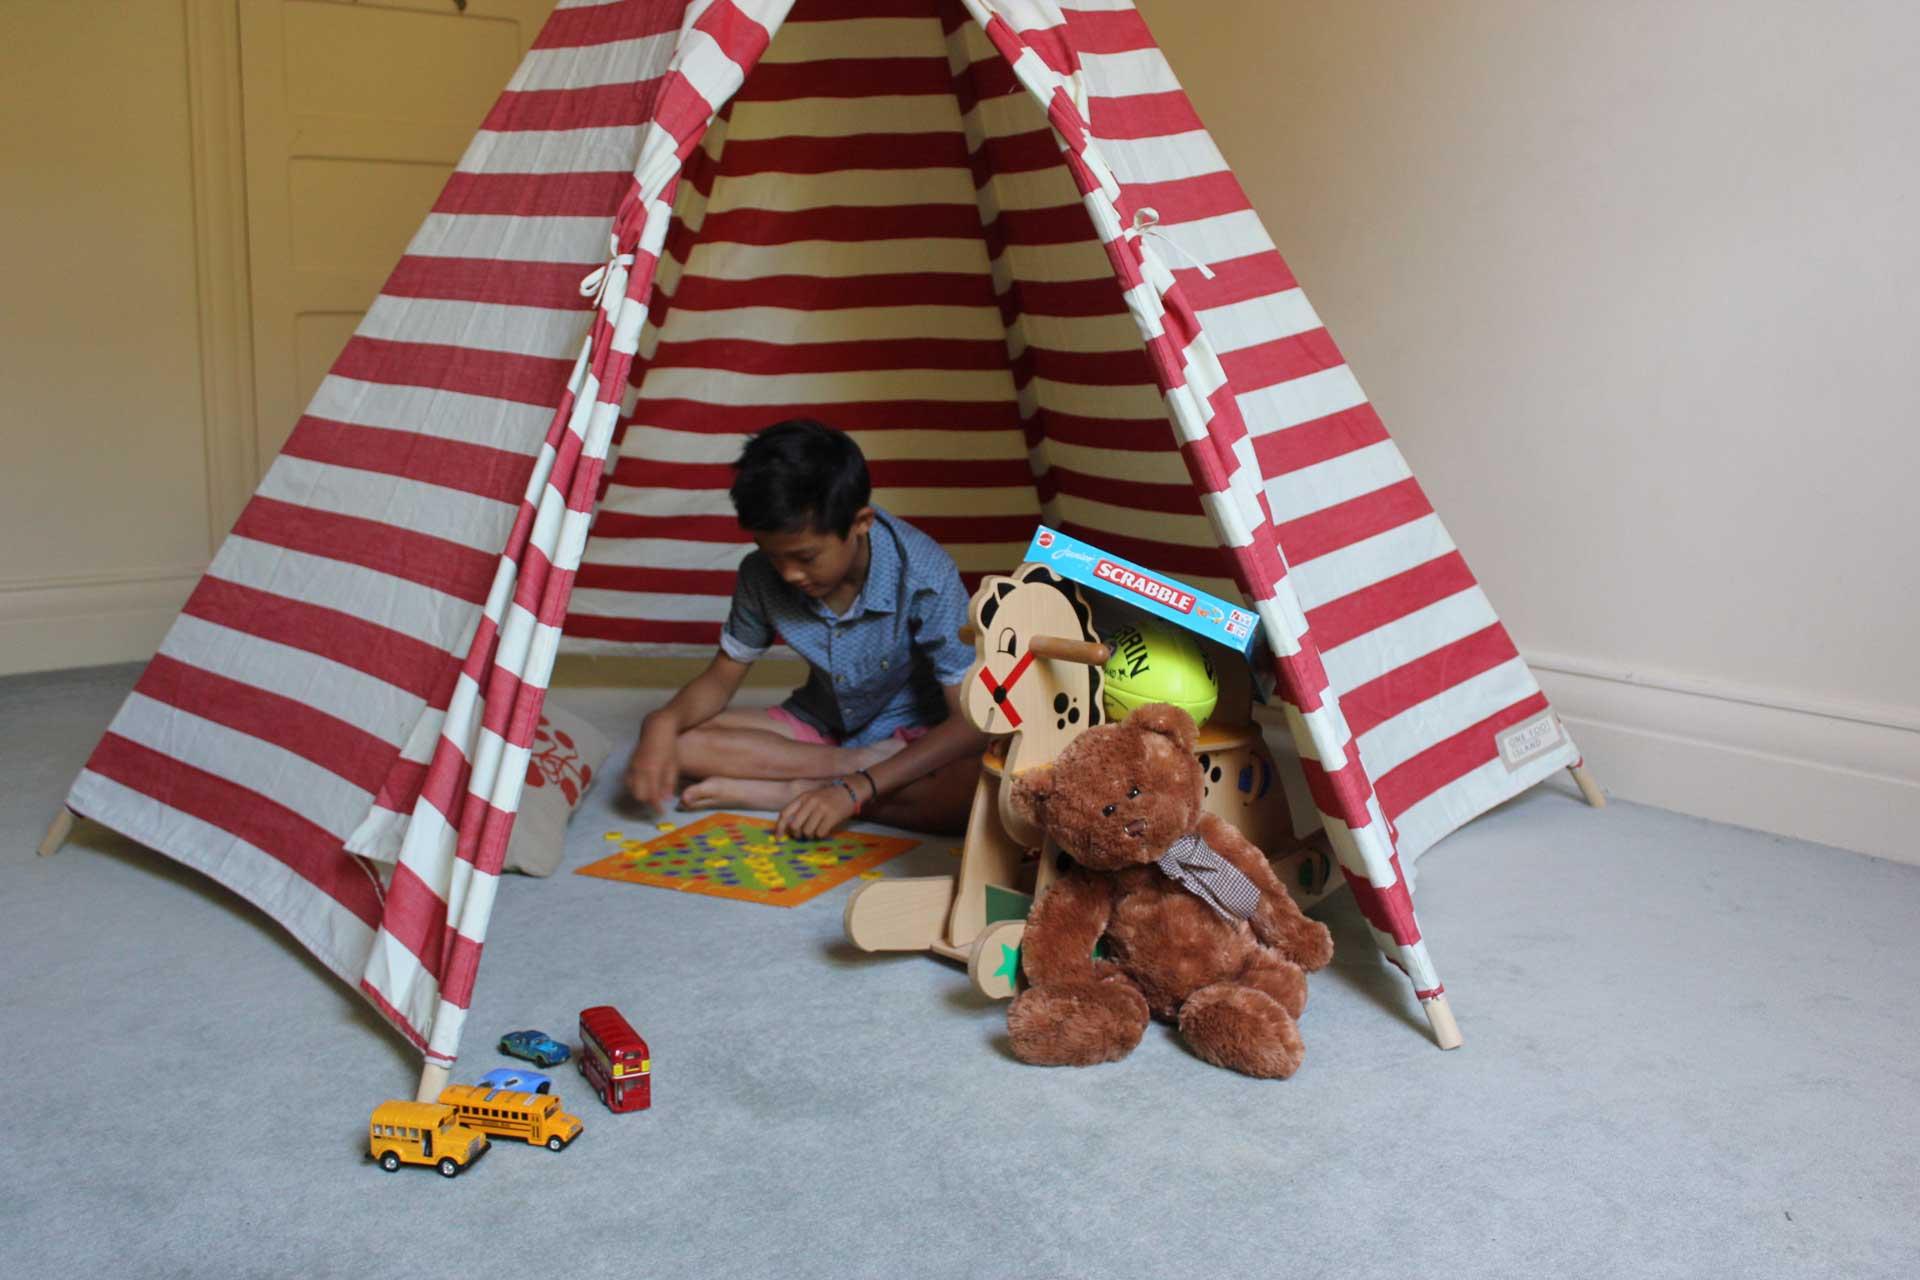 red-teepee-sun-tent